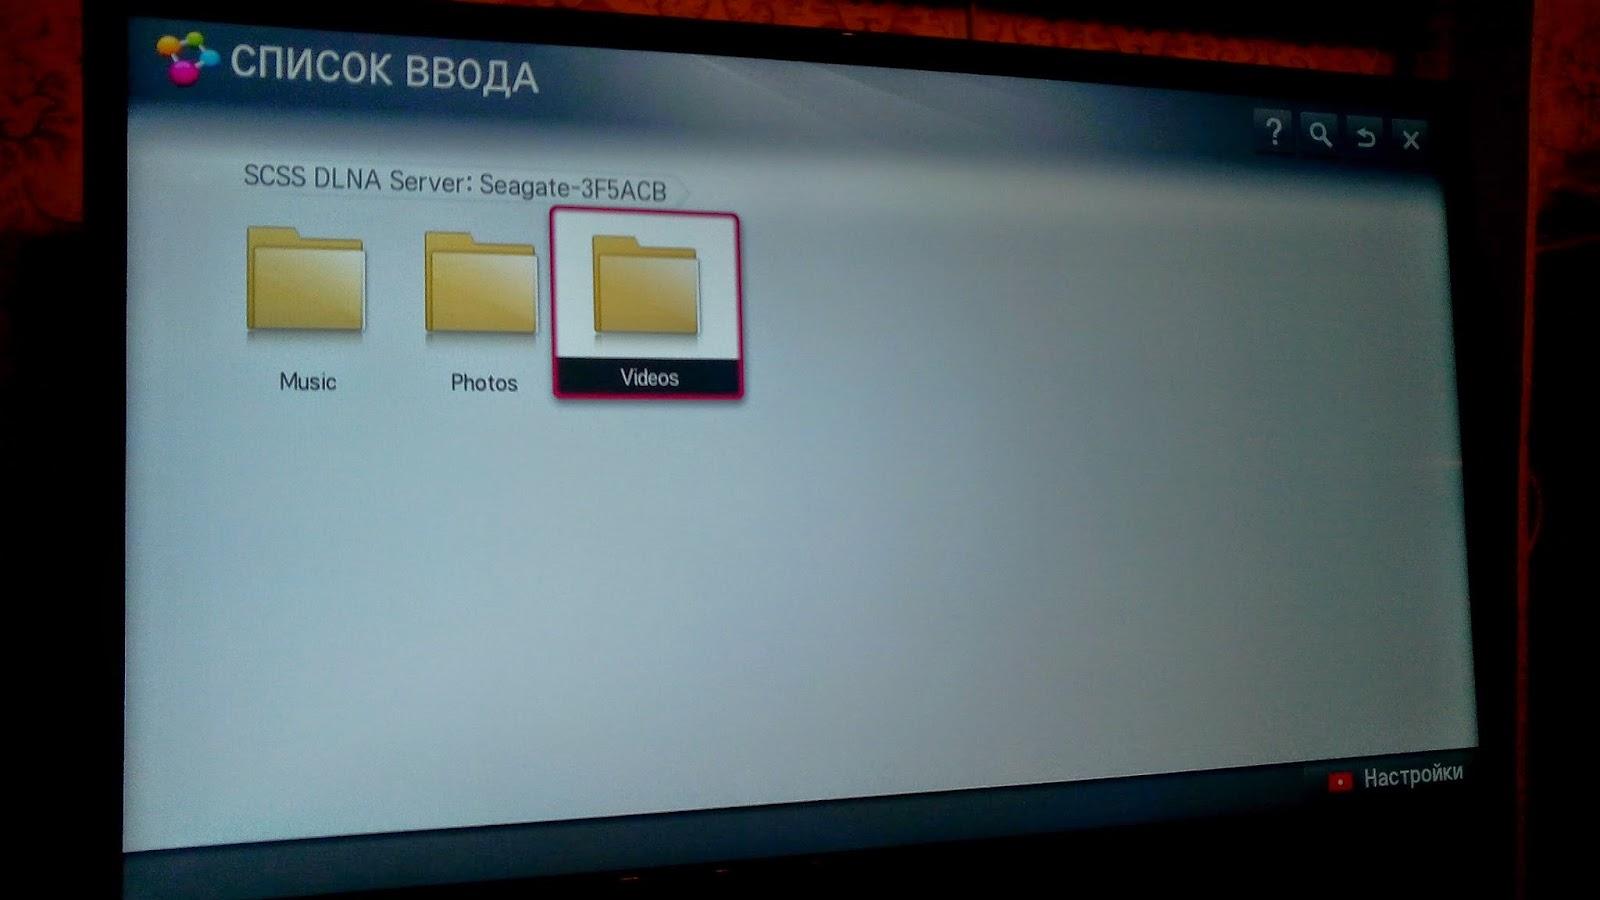 SmartTV Lg - Список файлов - DLNA